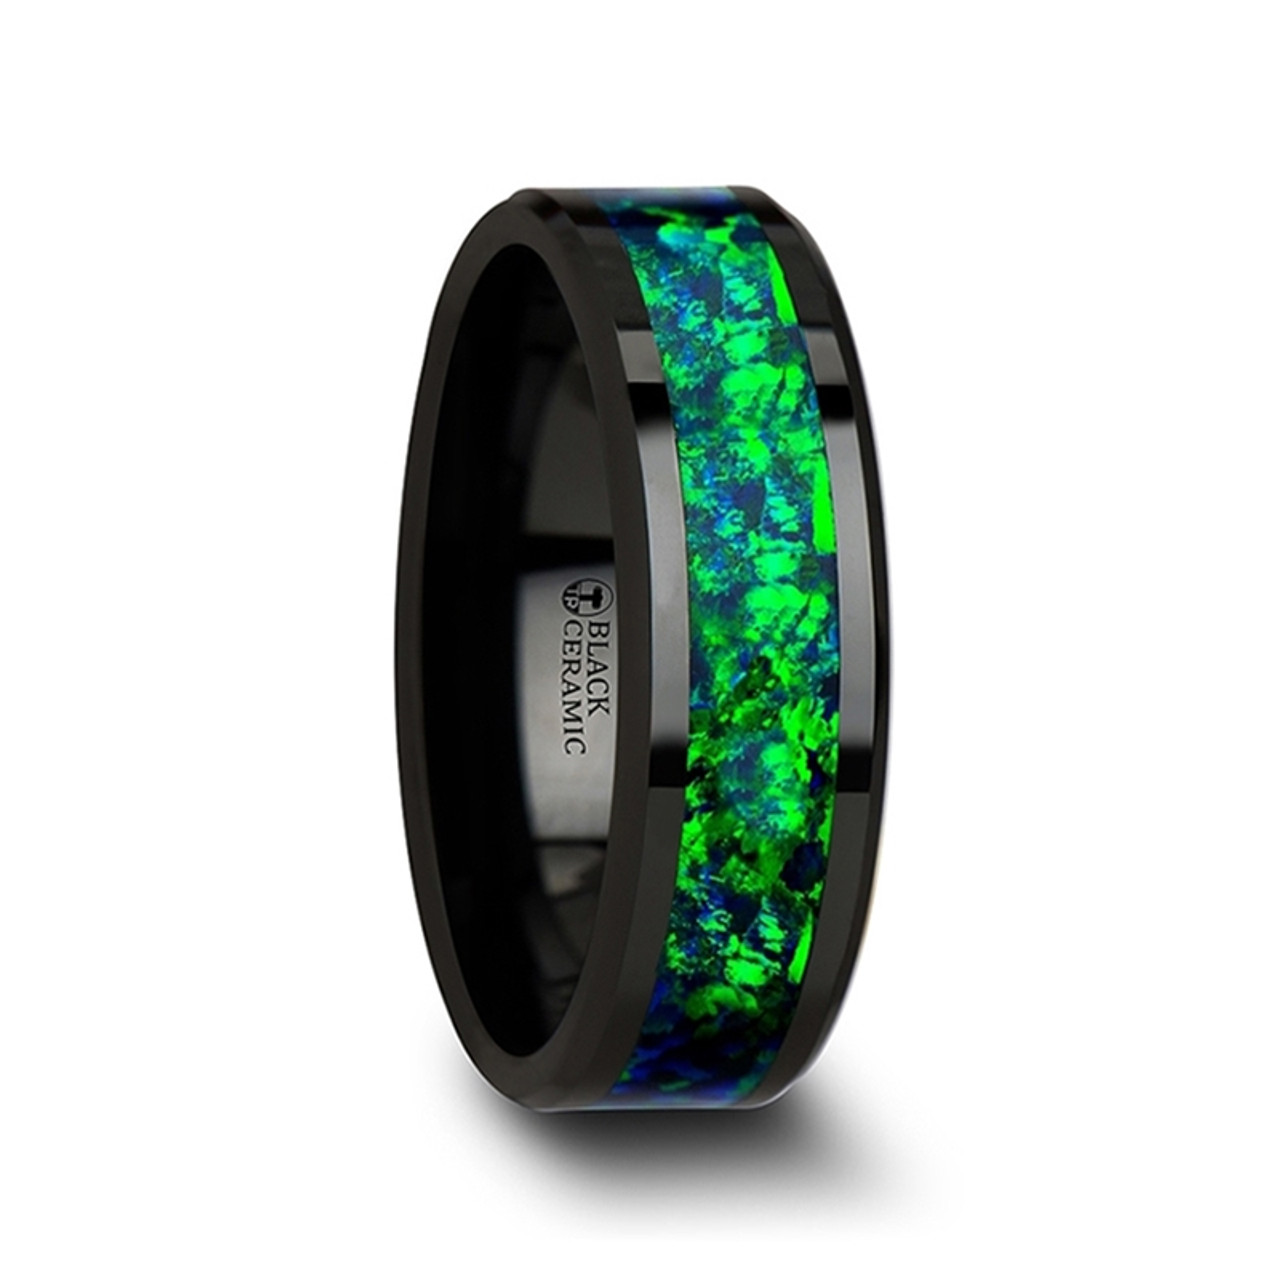 Tread Black Ceramic Wedding Band With Emerald Green Shire Blue Color Opal Inlay At Rotunda